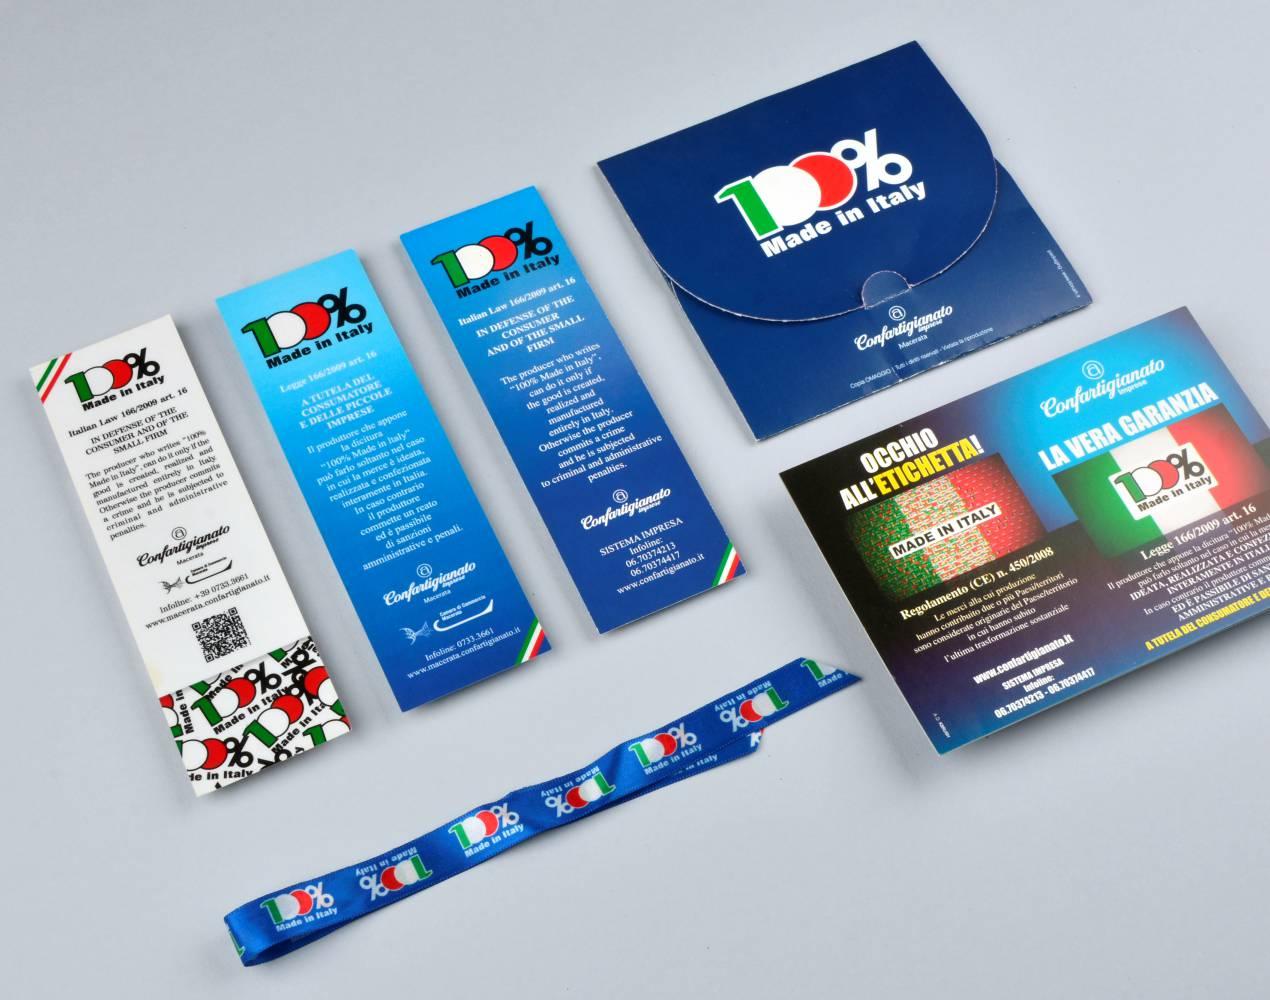 100% Made in Italy – Studio Grafico Macerata Tolentino KBRUSH